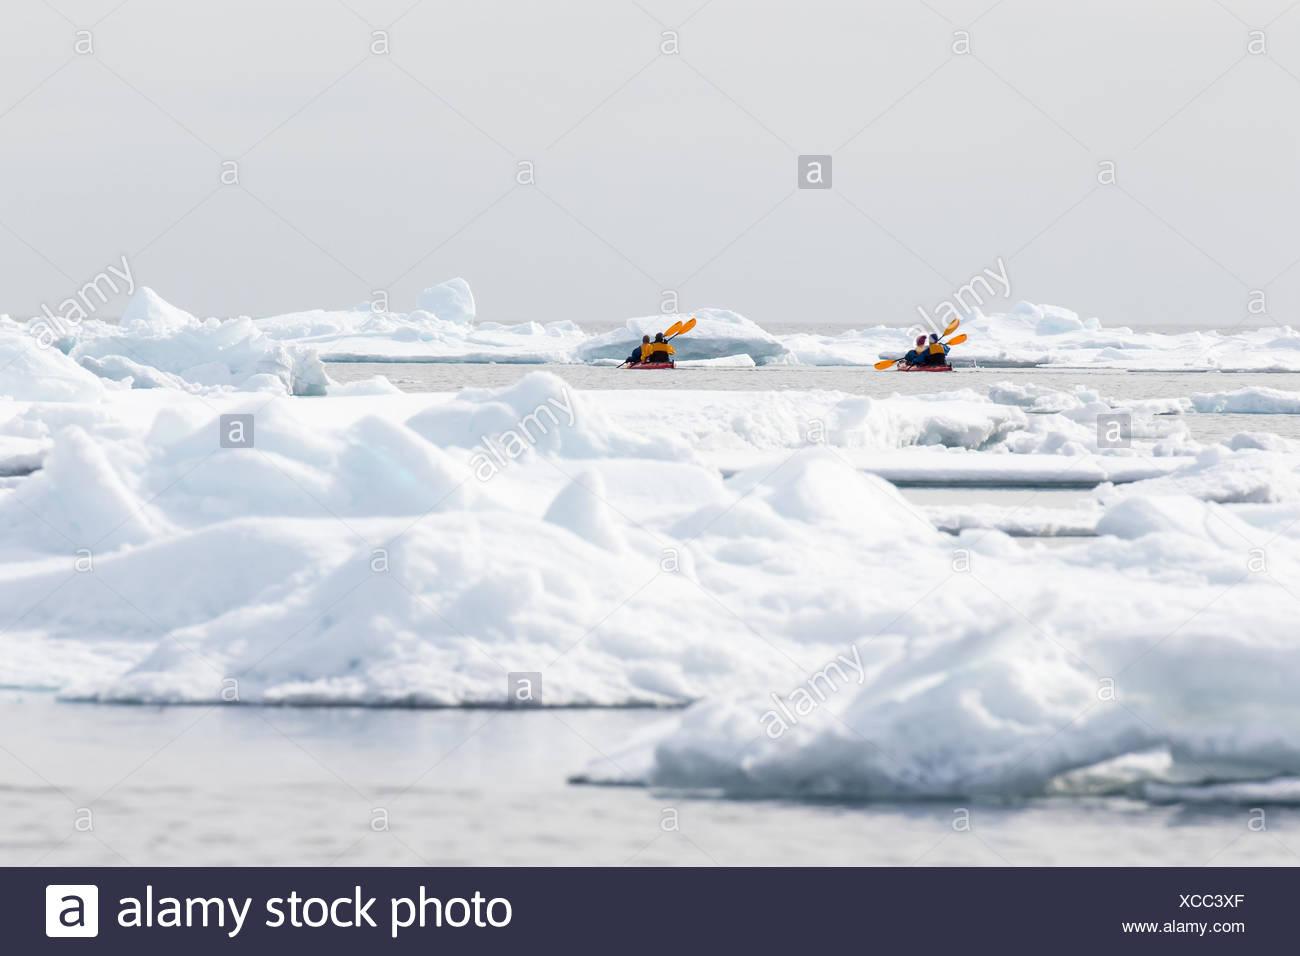 Canoeists amid icebergs on the sea ice edge of North Spitsbergen, Norway - Stock Image